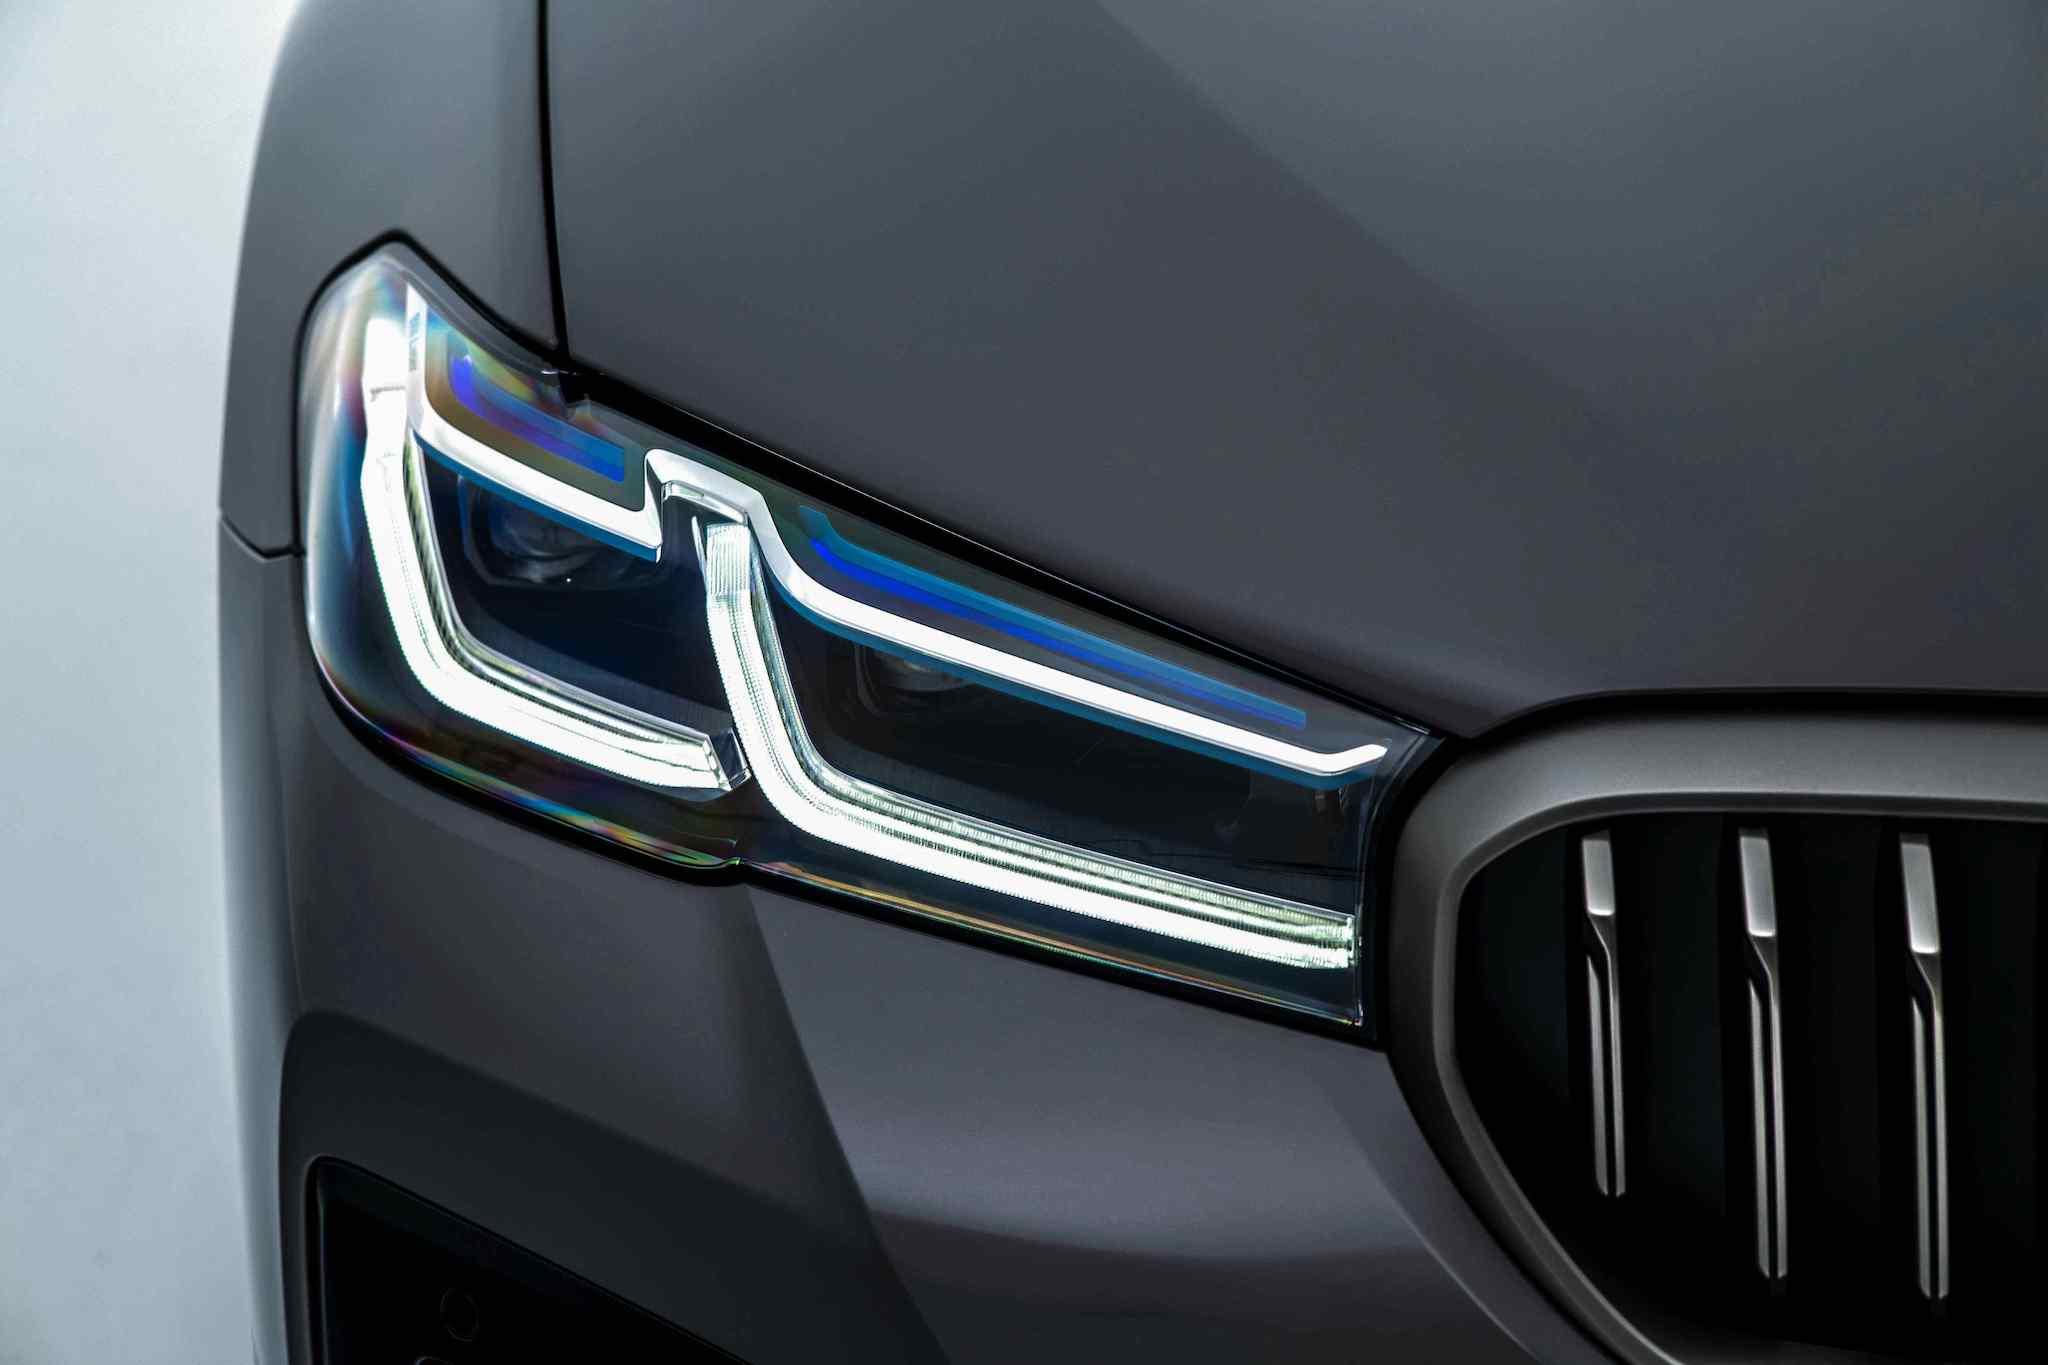 BMW M550i 標準配備全新設計的湛藍色智慧雷射頭燈(含Glare-free光型變化功能)。